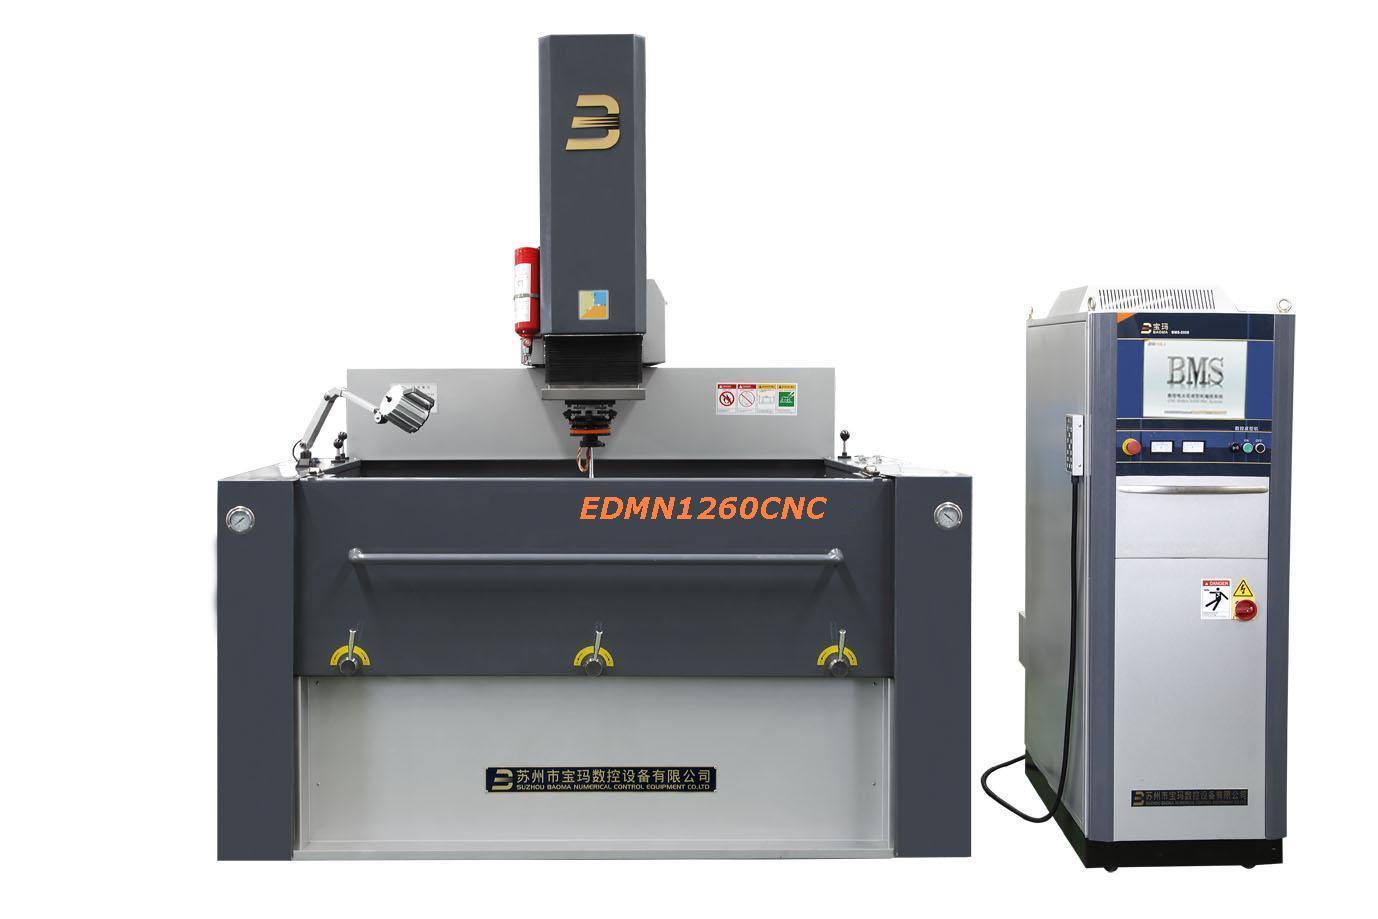 CNC Sinker EDM (EDMN1260CNC)